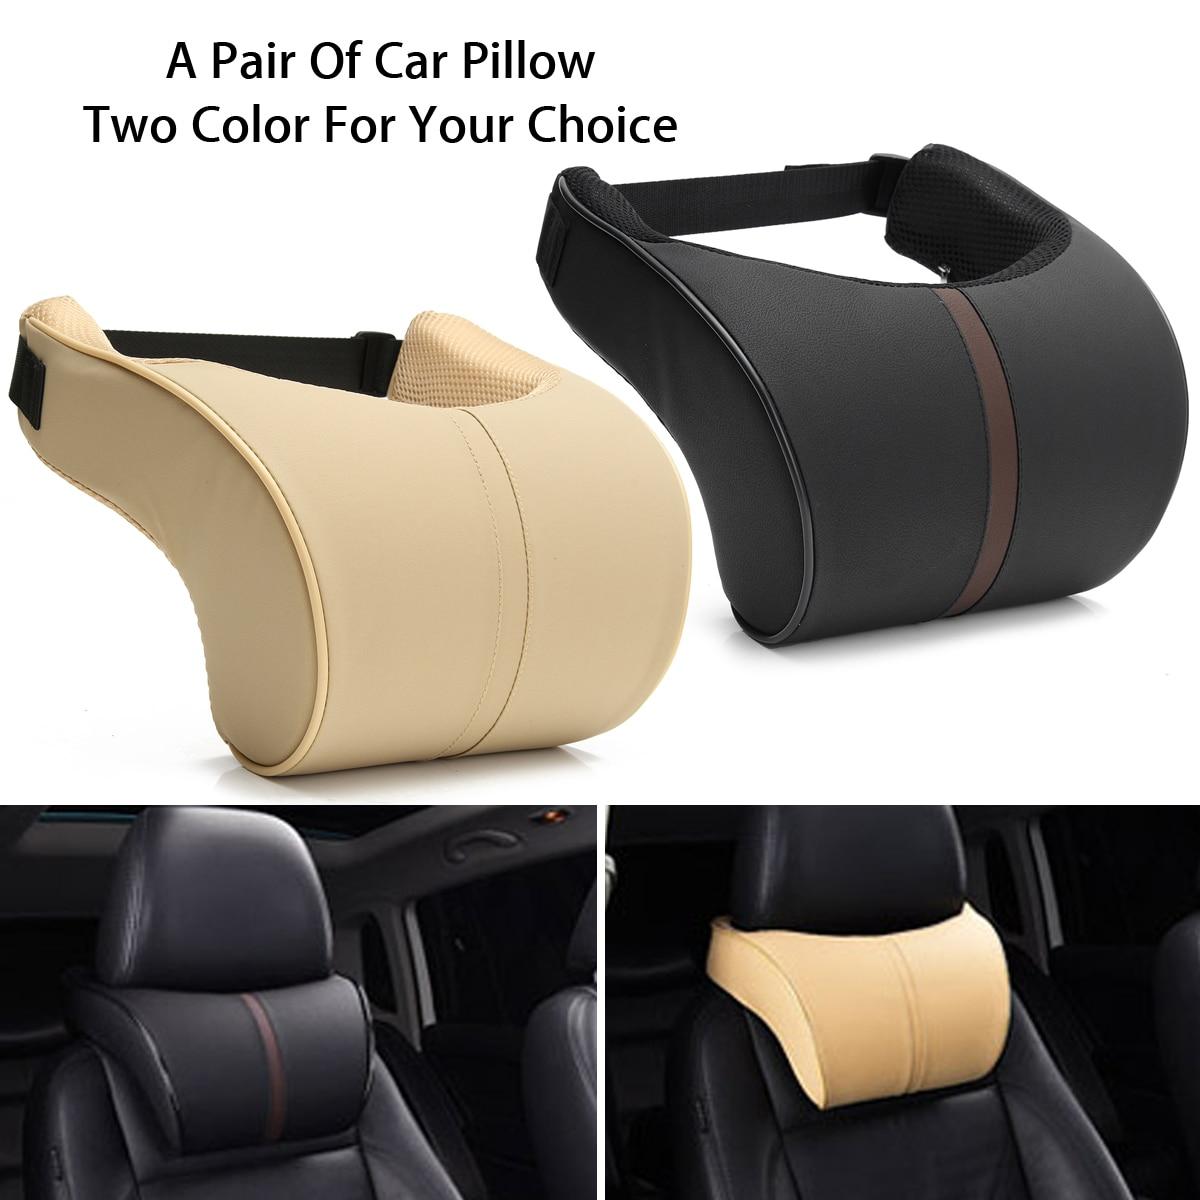 2x Car Seat Neck Pillow PU Leather Ergonomic Seat Headrest Pad Auto Car Neck Rest Memory Foam Pillows все цены